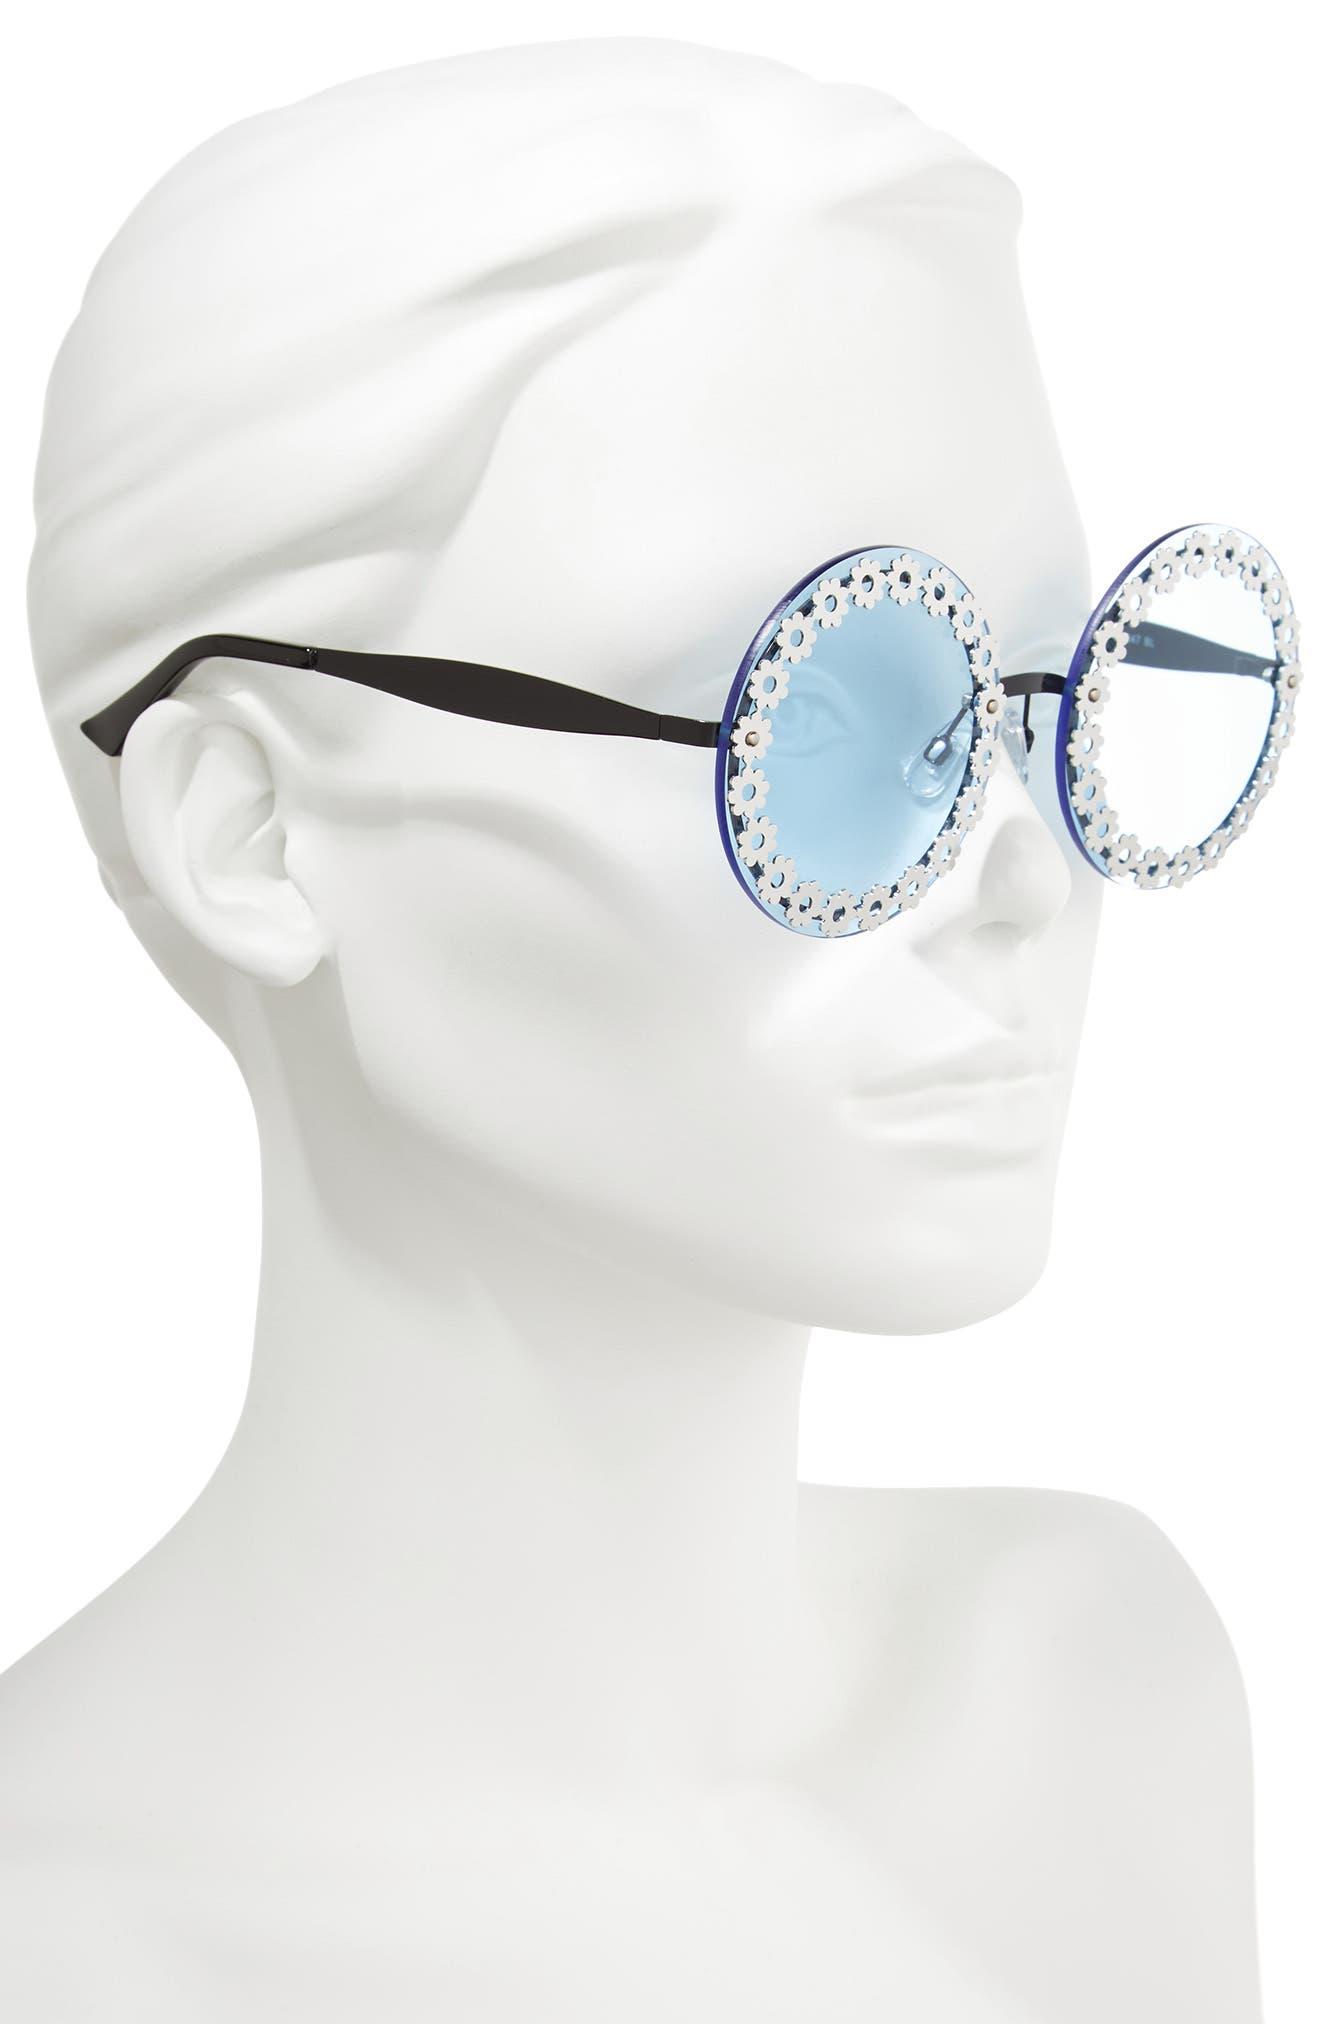 60mm Round Sunglasses,                             Alternate thumbnail 2, color,                             Blue/ Black